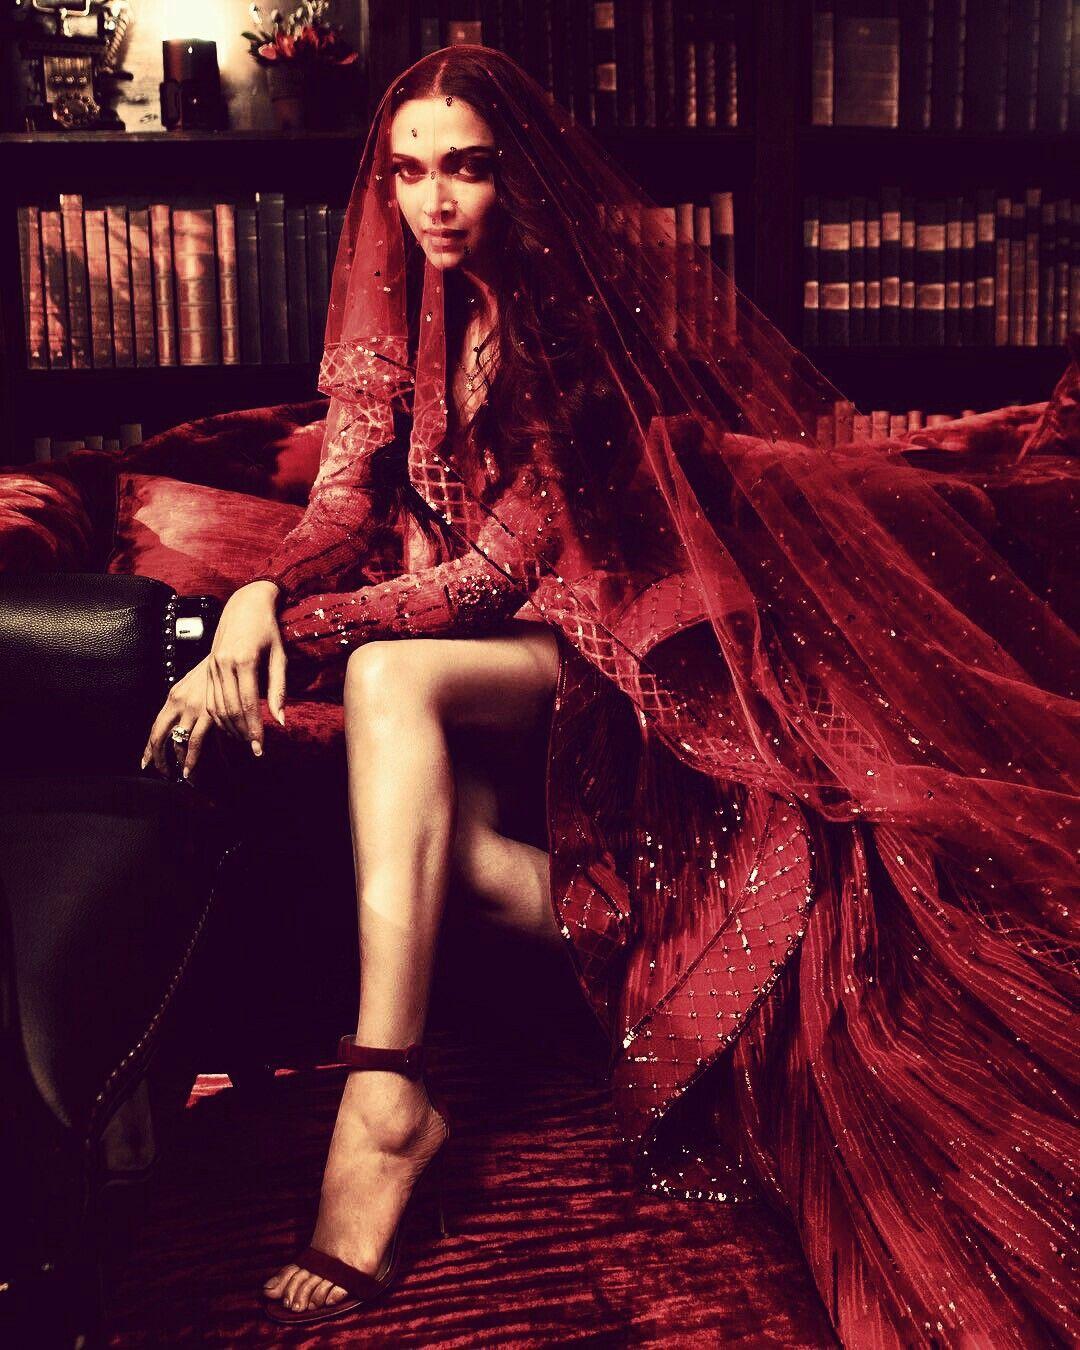 Pin by Hitu Zala on deepu ️   Indian photoshoot, Deepika ...